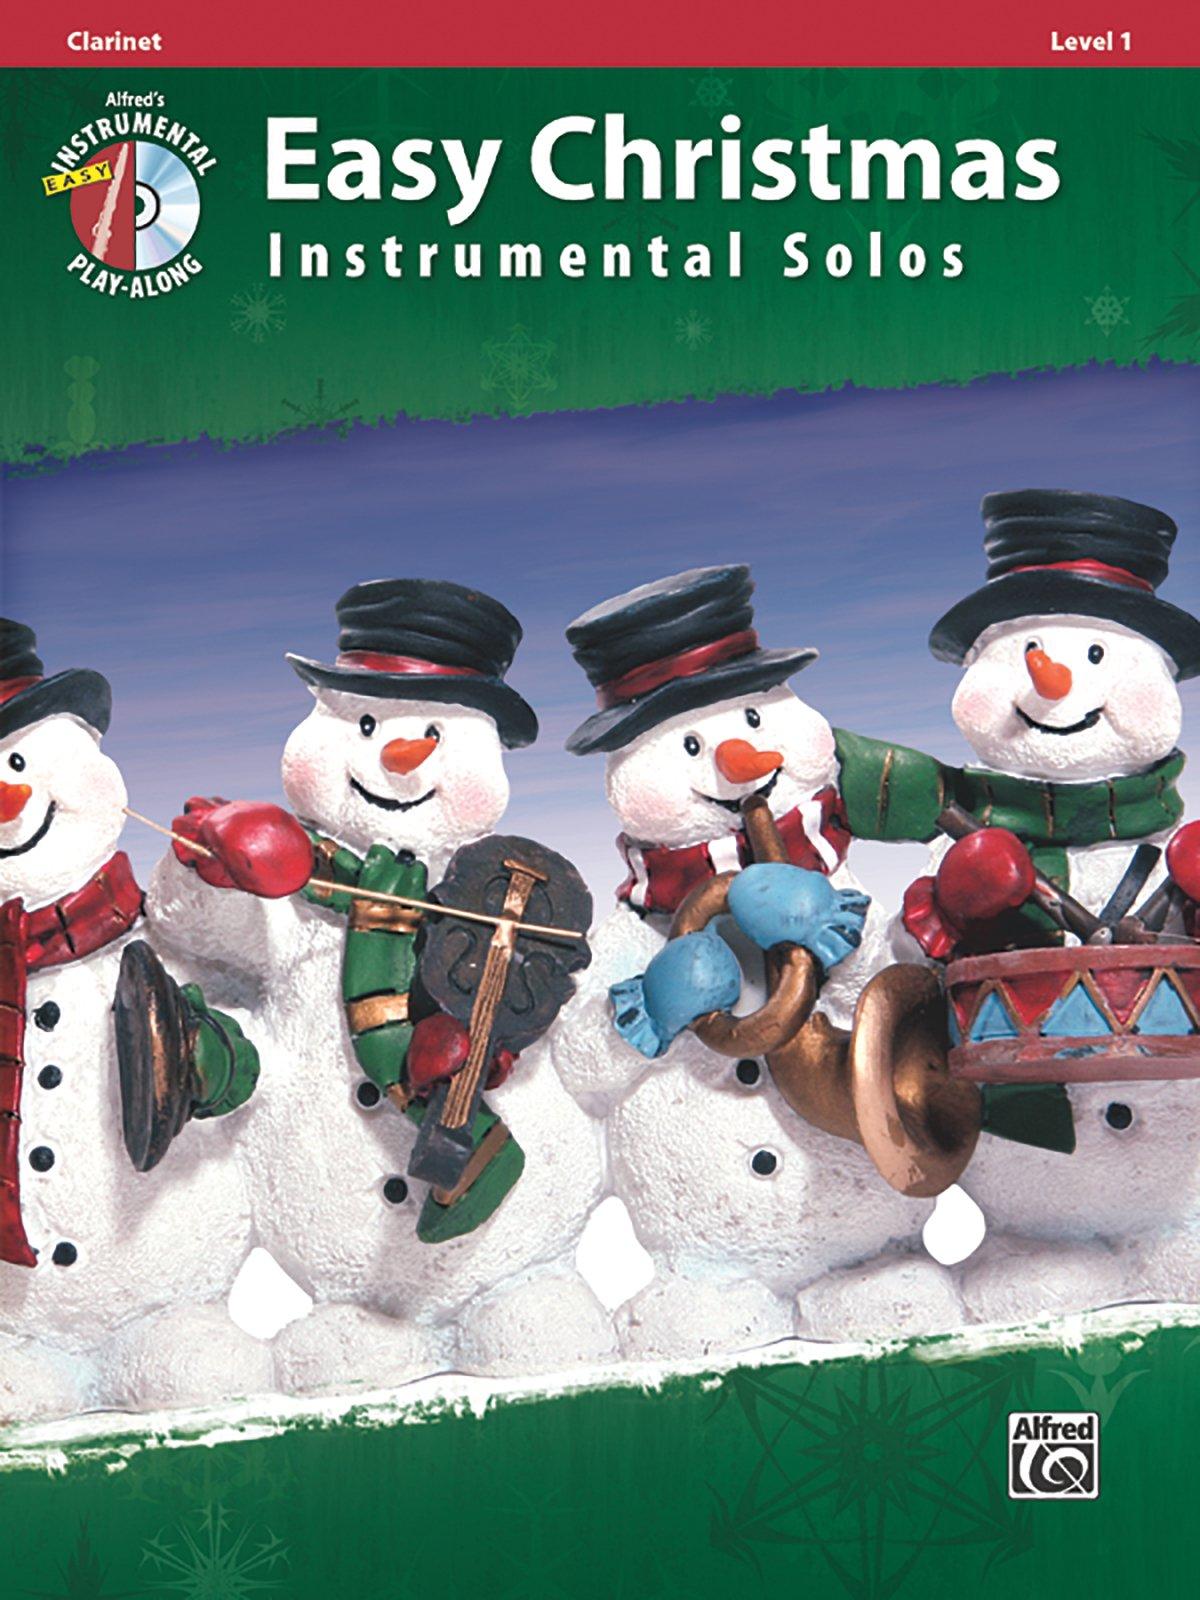 Easy Christmas Instrumental Solos, Level 1: Clarinet, Book & CD (Easy Instrumental Solos Series) pdf